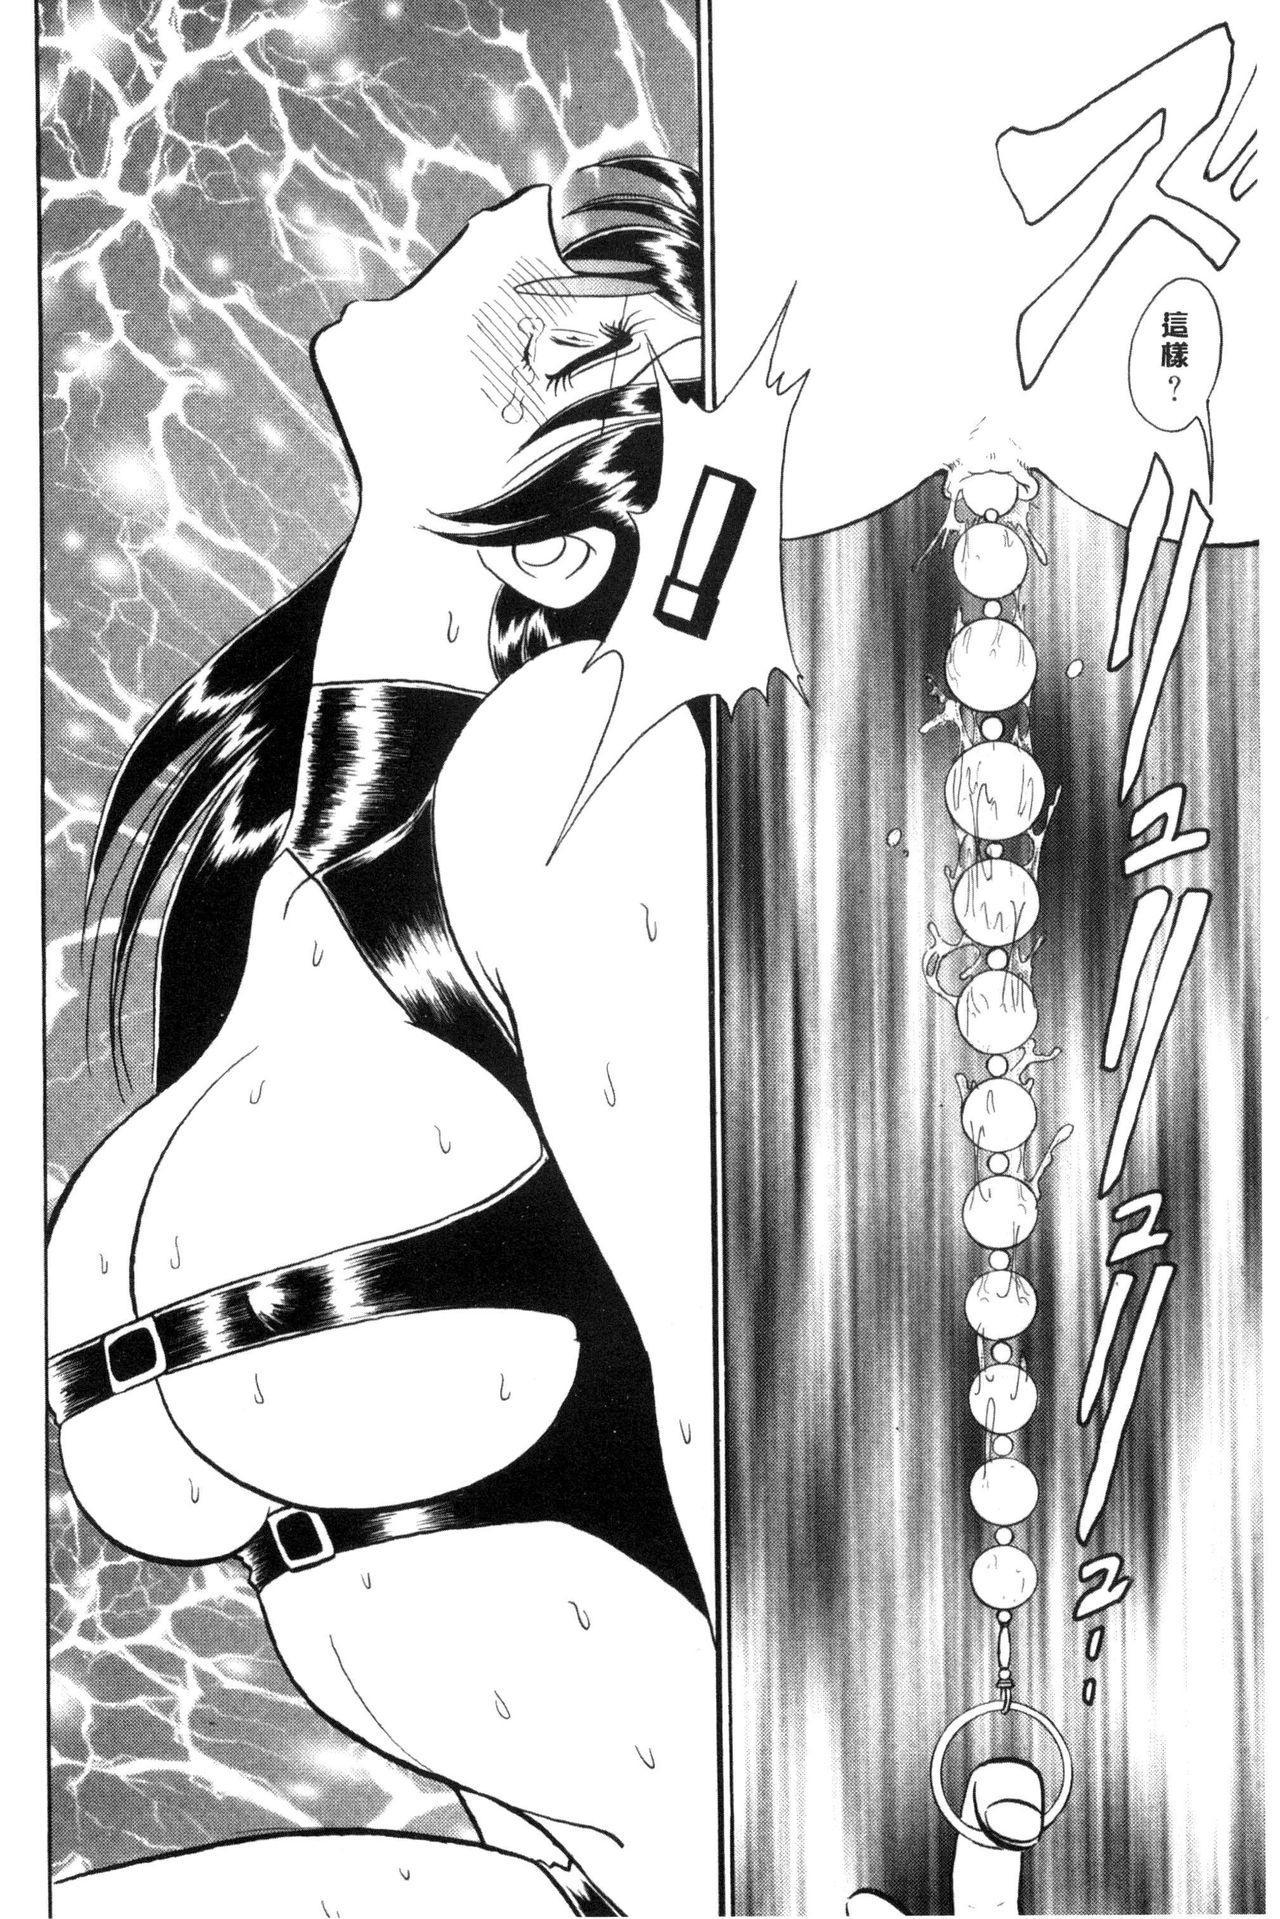 Hazukashii Kagai Jugyou | 害羞的課外授業 72